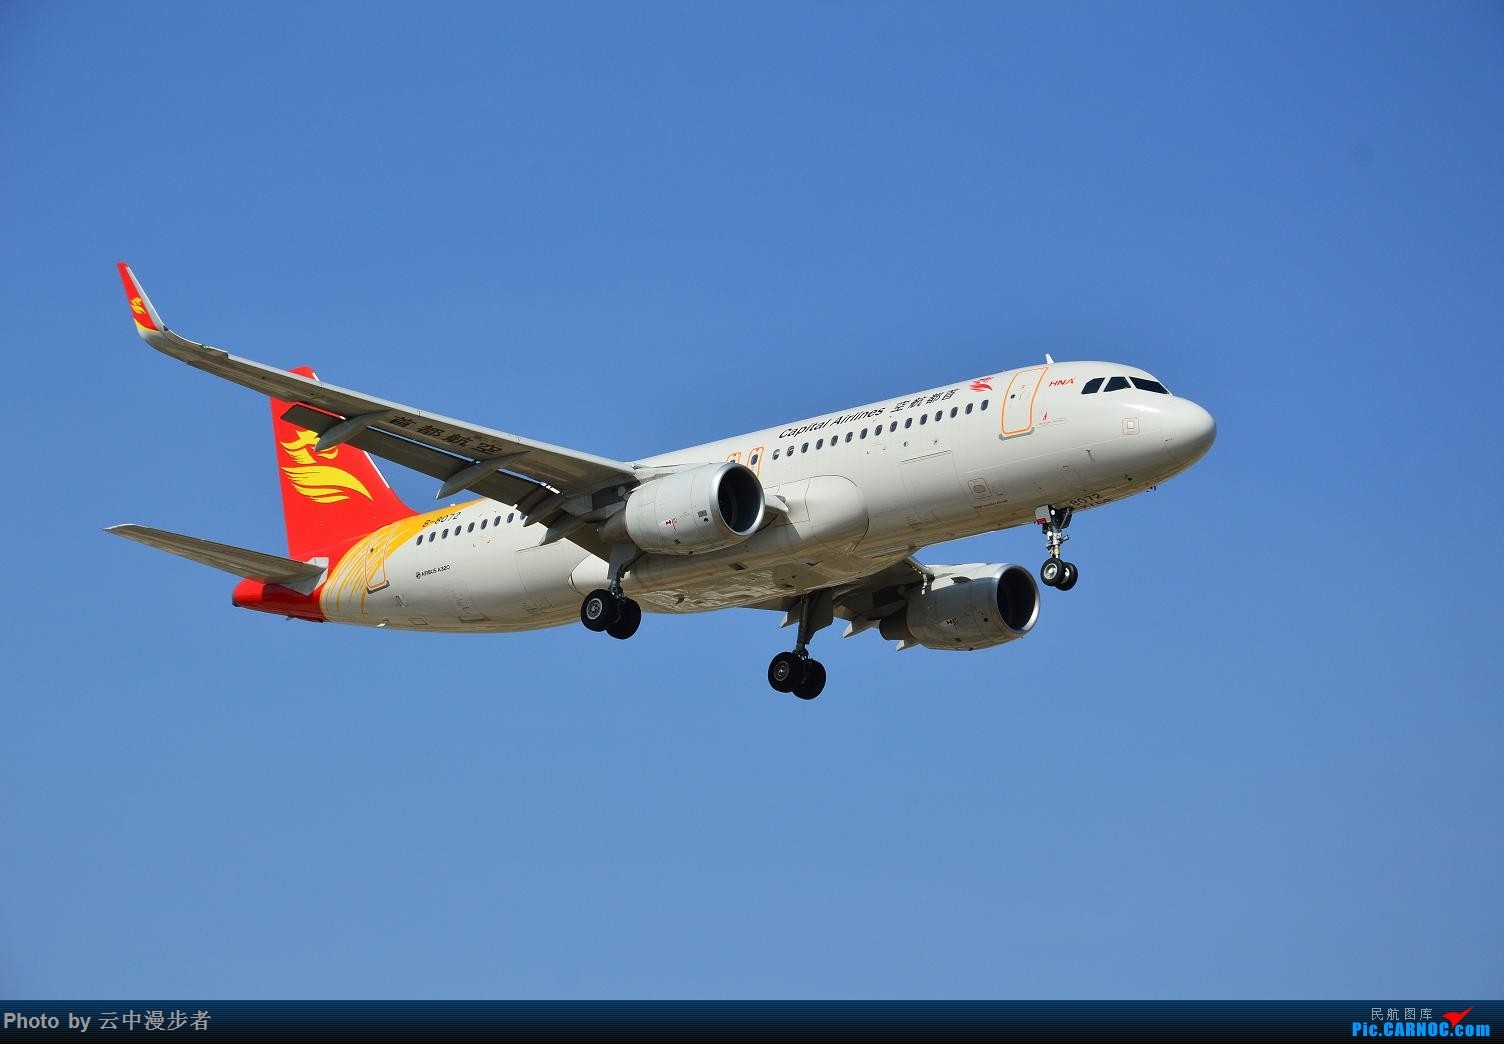 Re:[原创]好天就是好货,拍什么都好看 AIRBUS A320-200 B-8072 中国厦门高崎国际机场